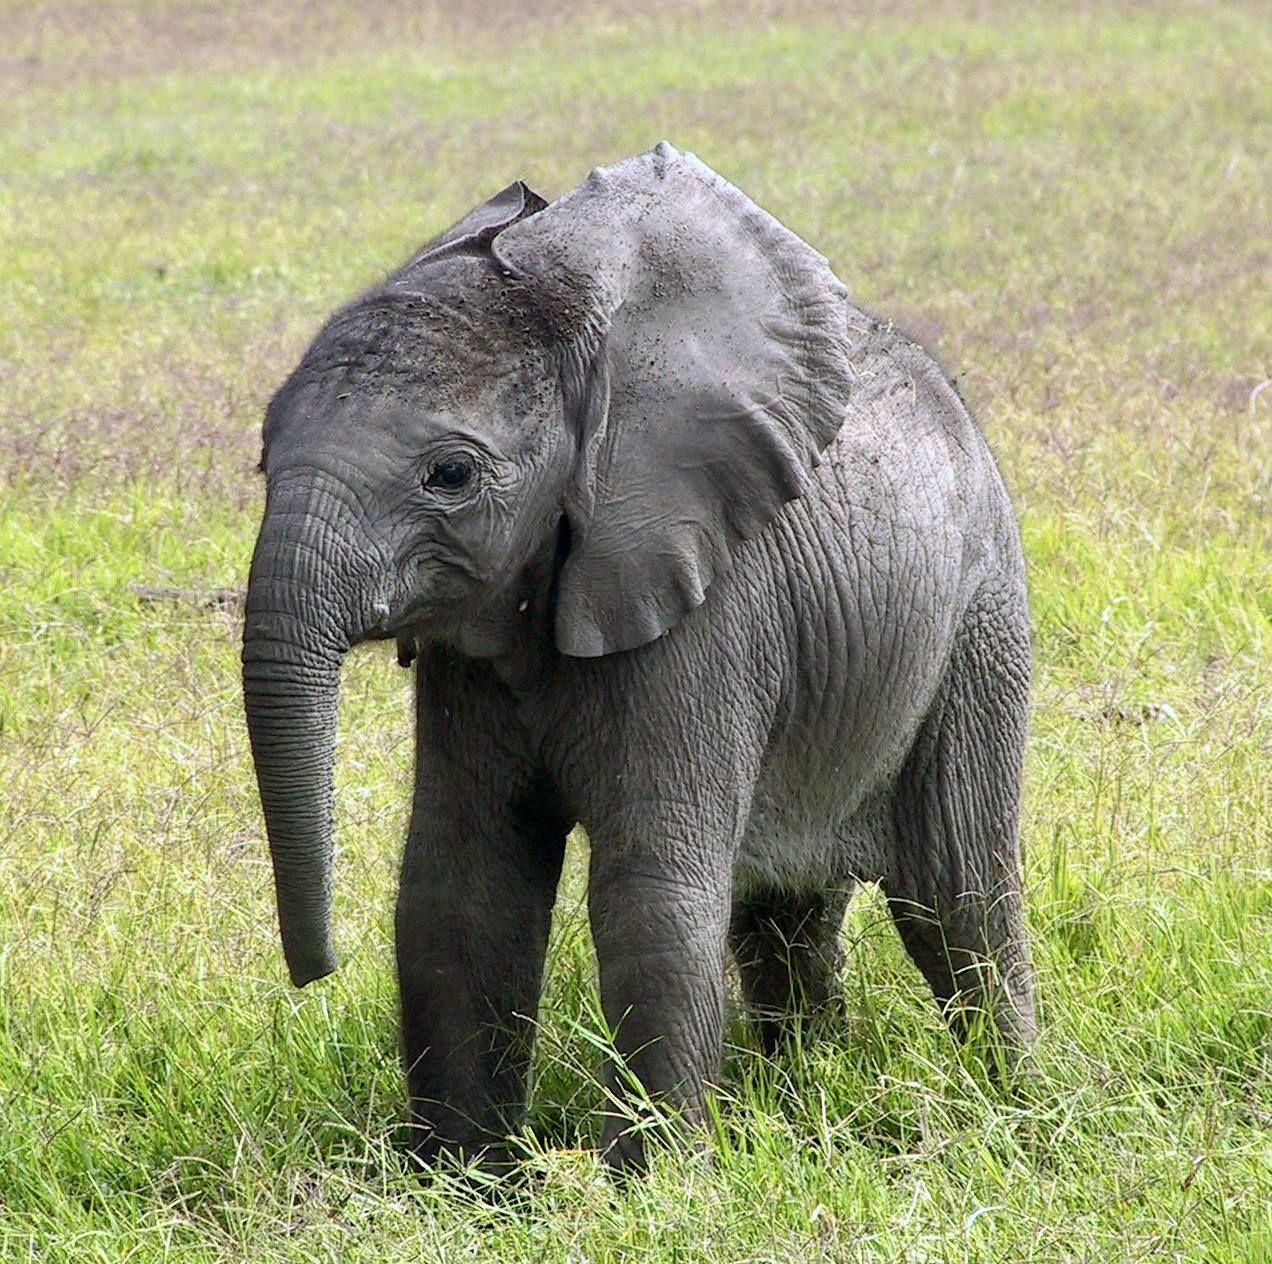 Elephant, Funny Elephant, African